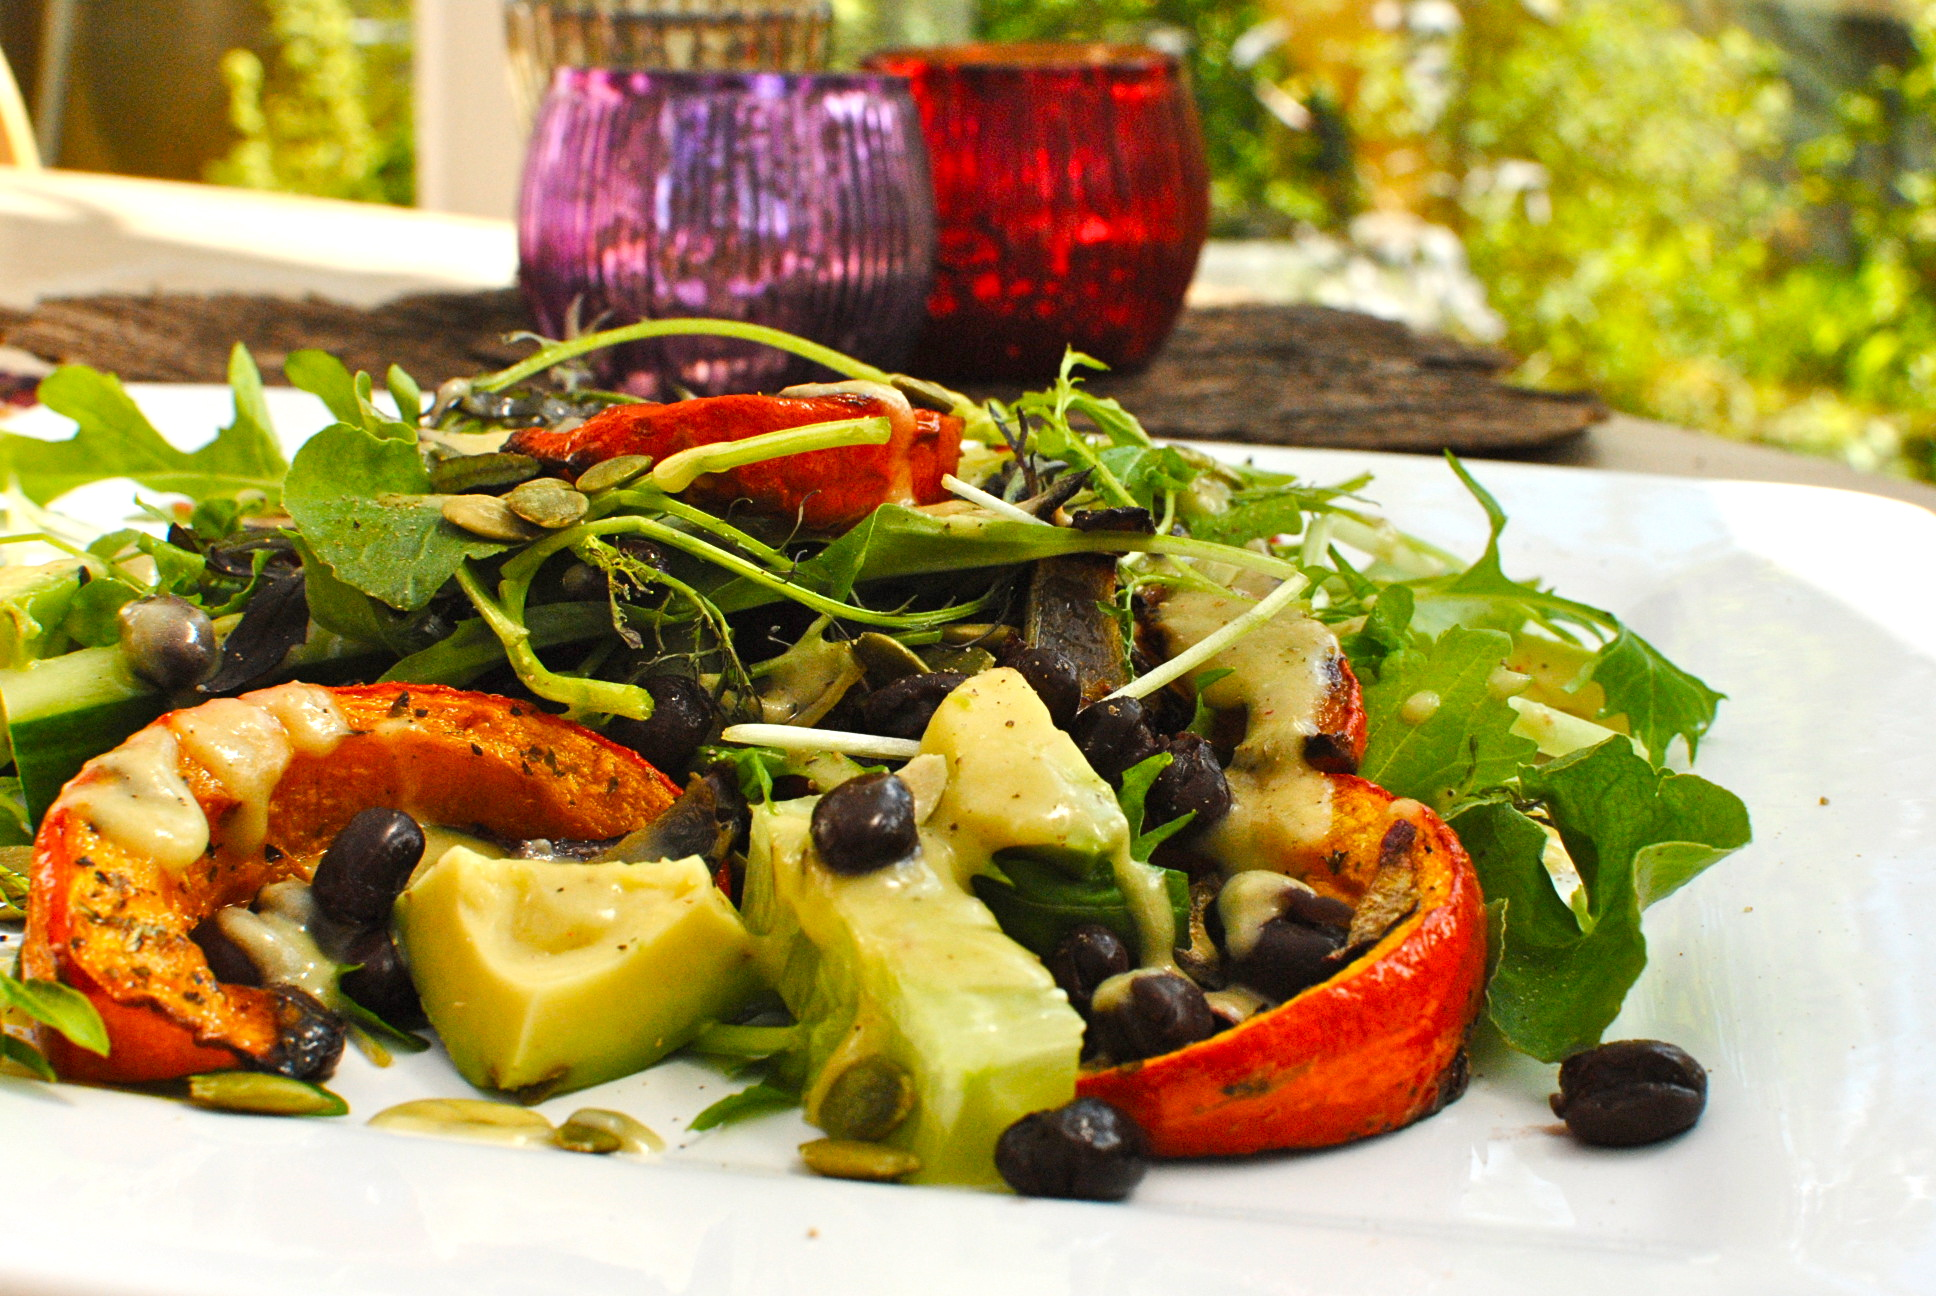 roasted uchiri kuri squash spa salad with chipotle avocado dressing